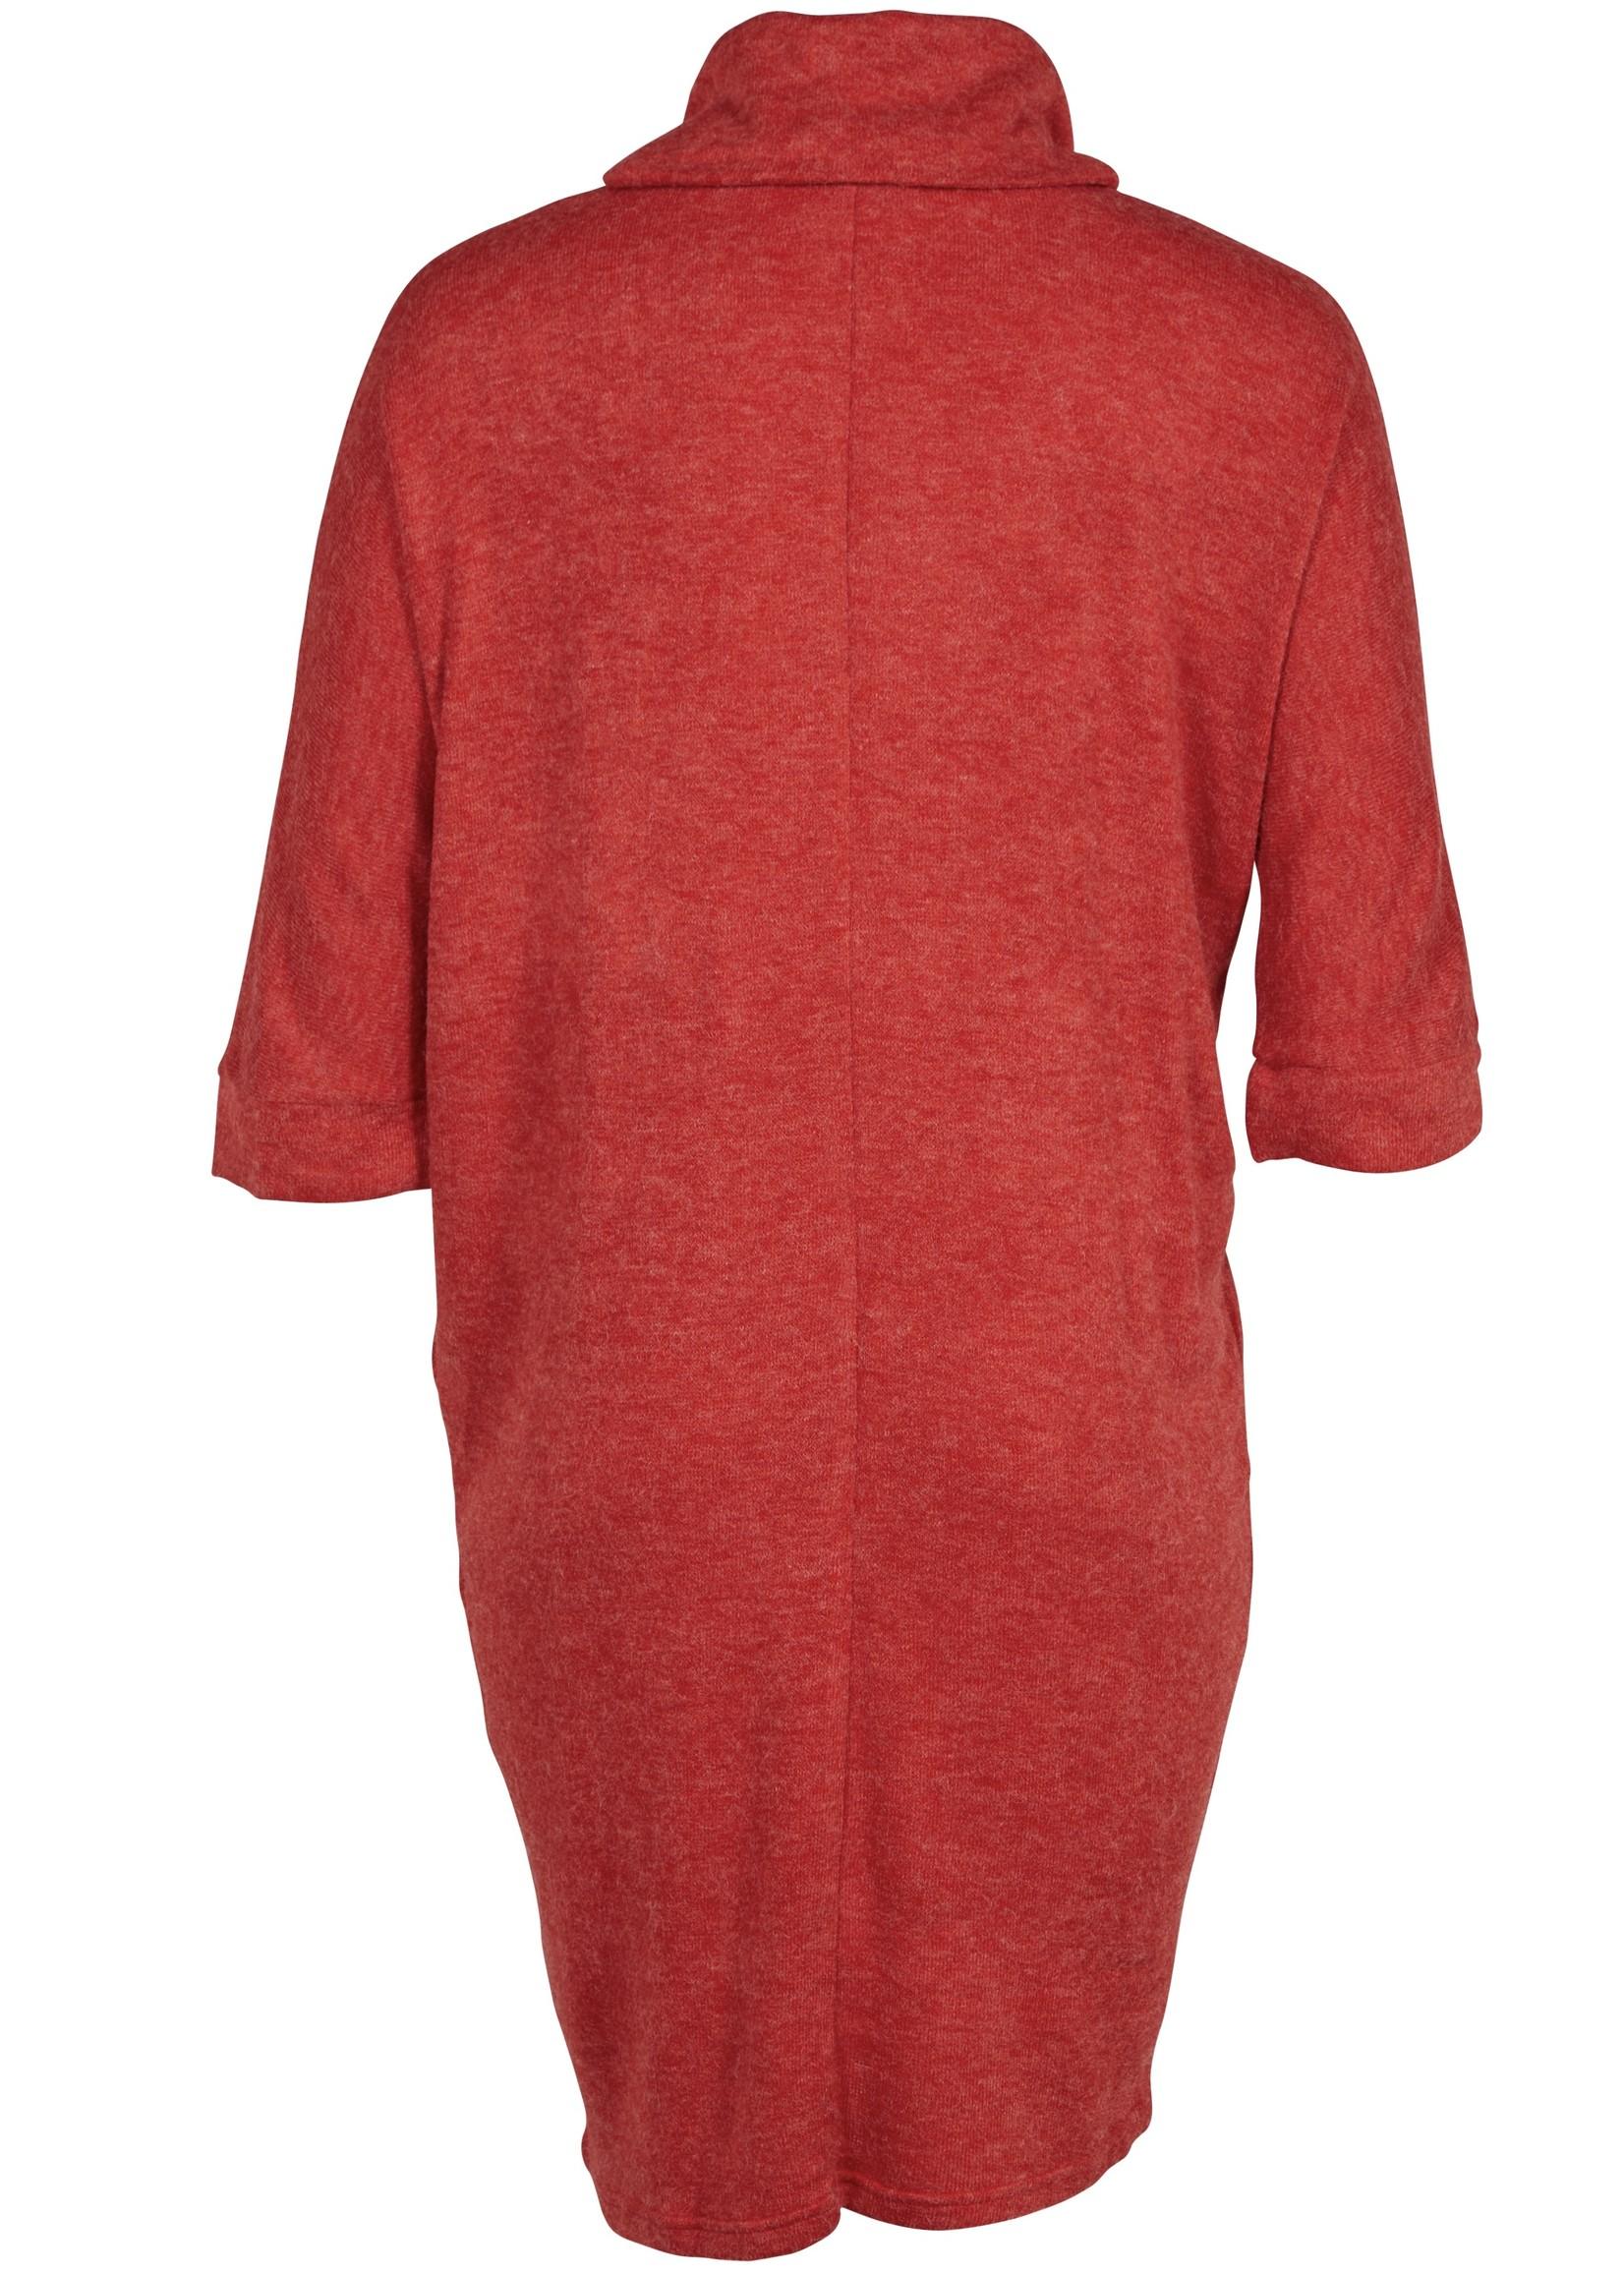 Zoey Zoey Penelope Dress